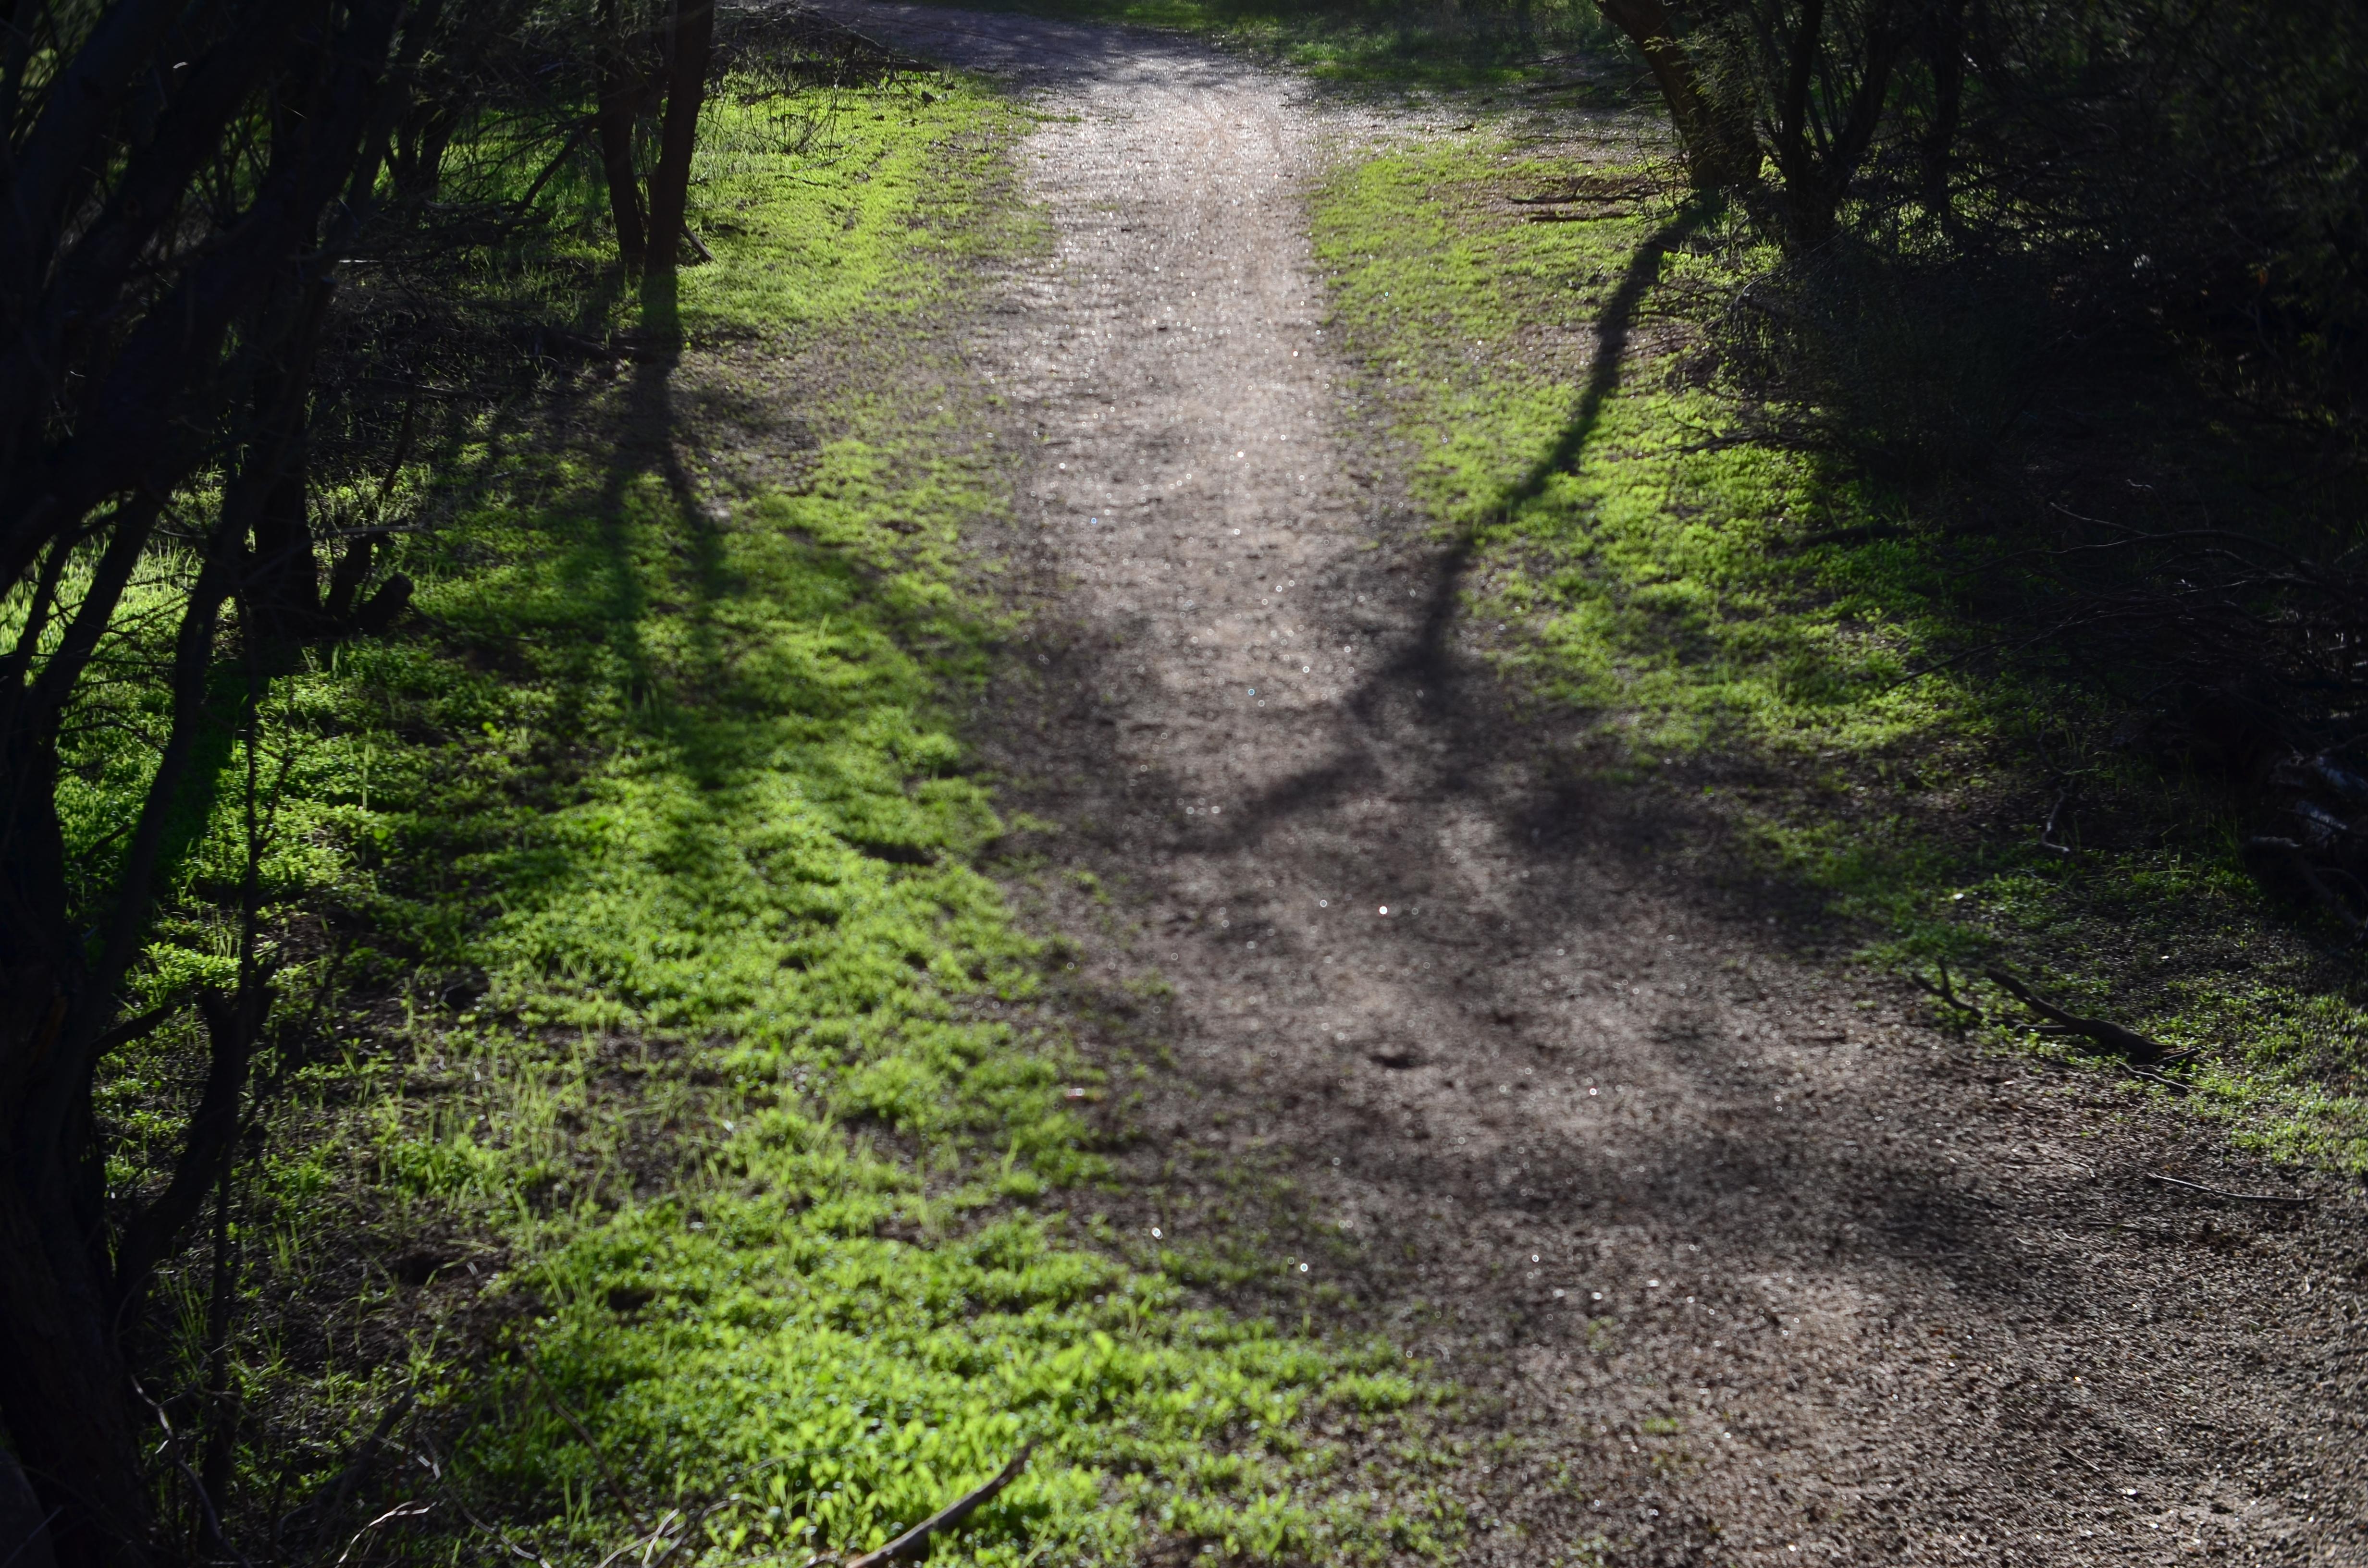 A sunlit forest path.